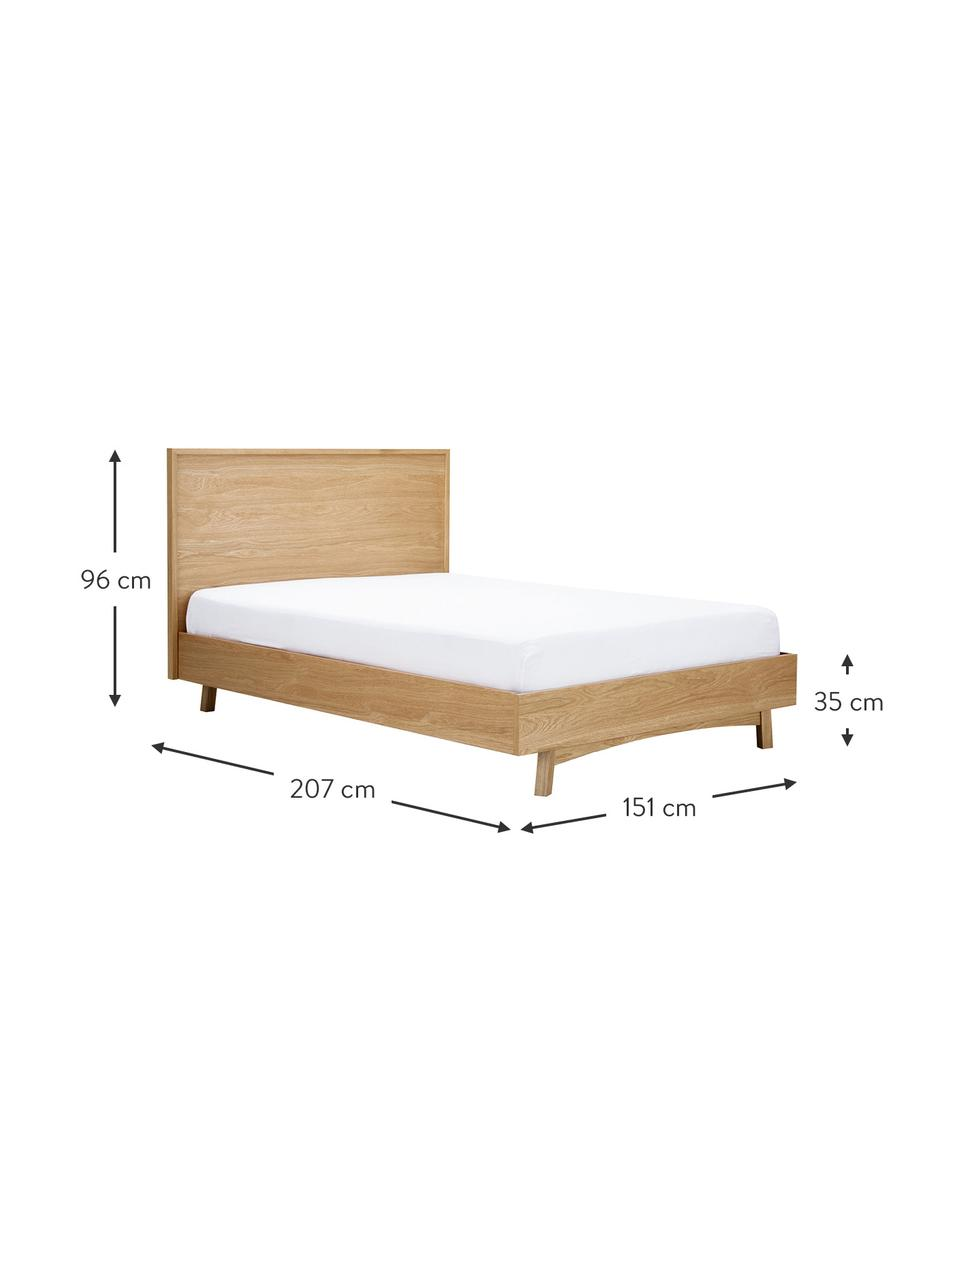 Lit en bois avec tête de lit Tammy, Bois de chêne